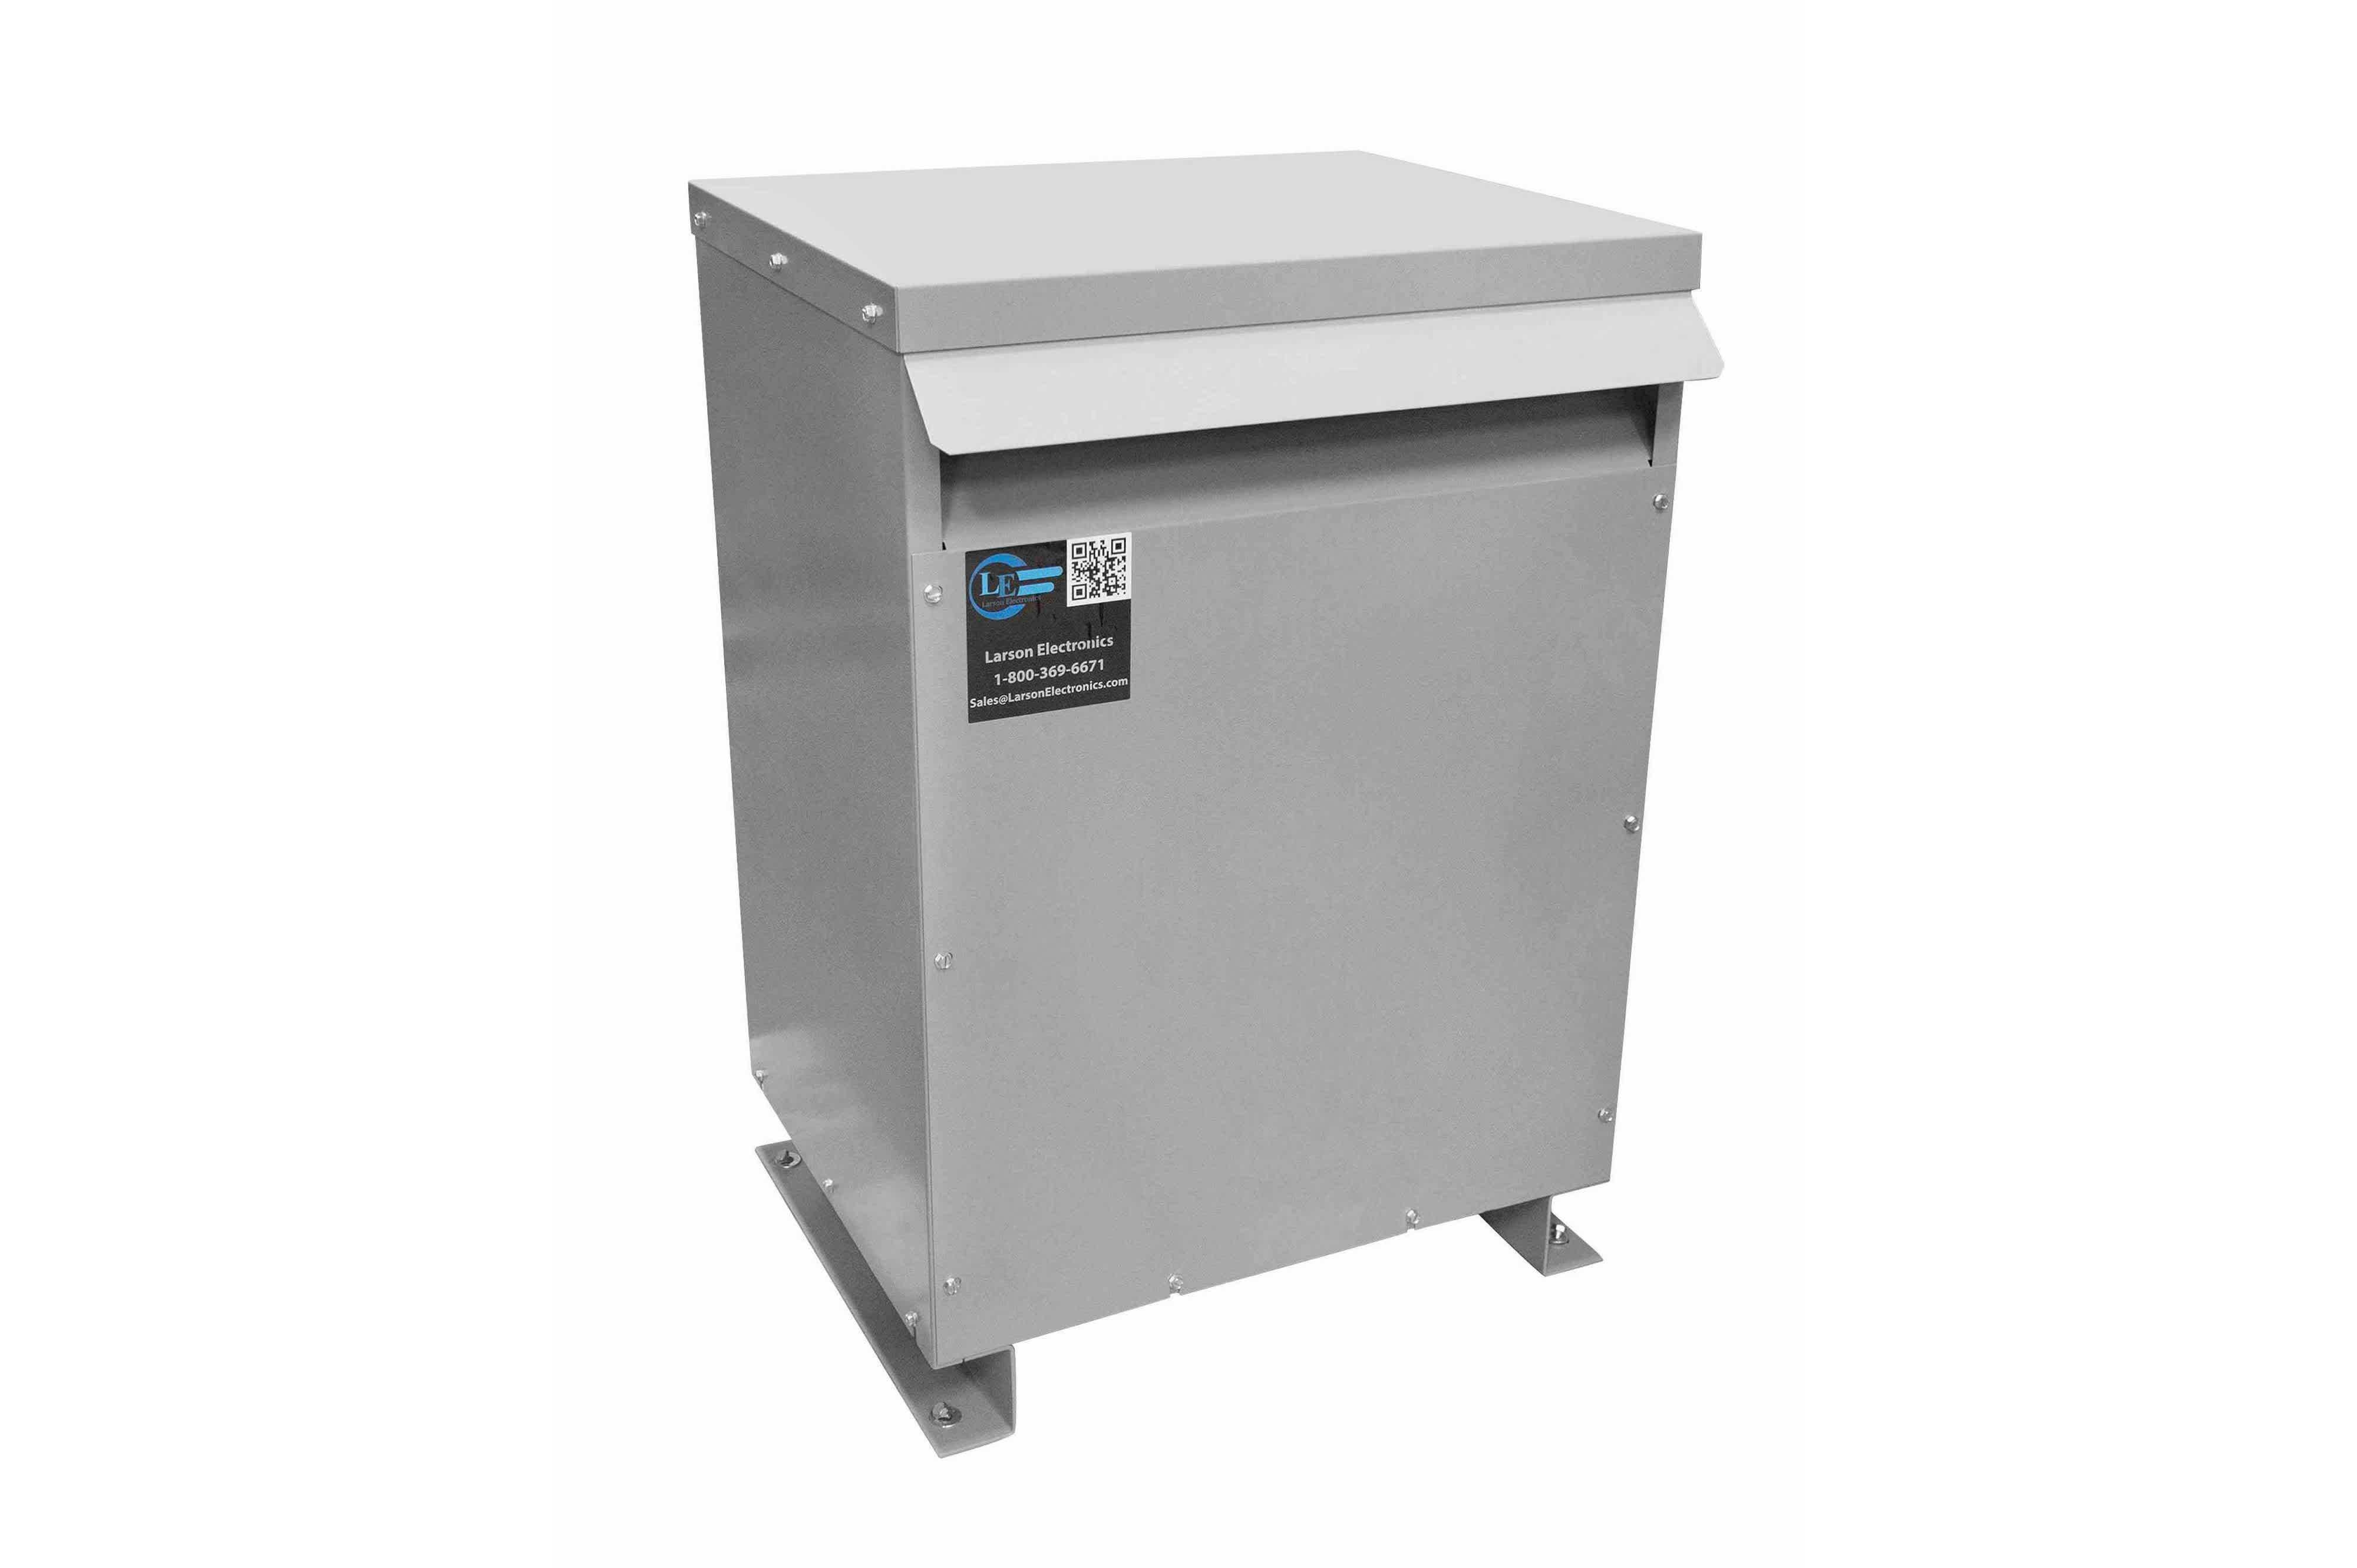 275 kVA 3PH Isolation Transformer, 380V Wye Primary, 480V Delta Secondary, N3R, Ventilated, 60 Hz